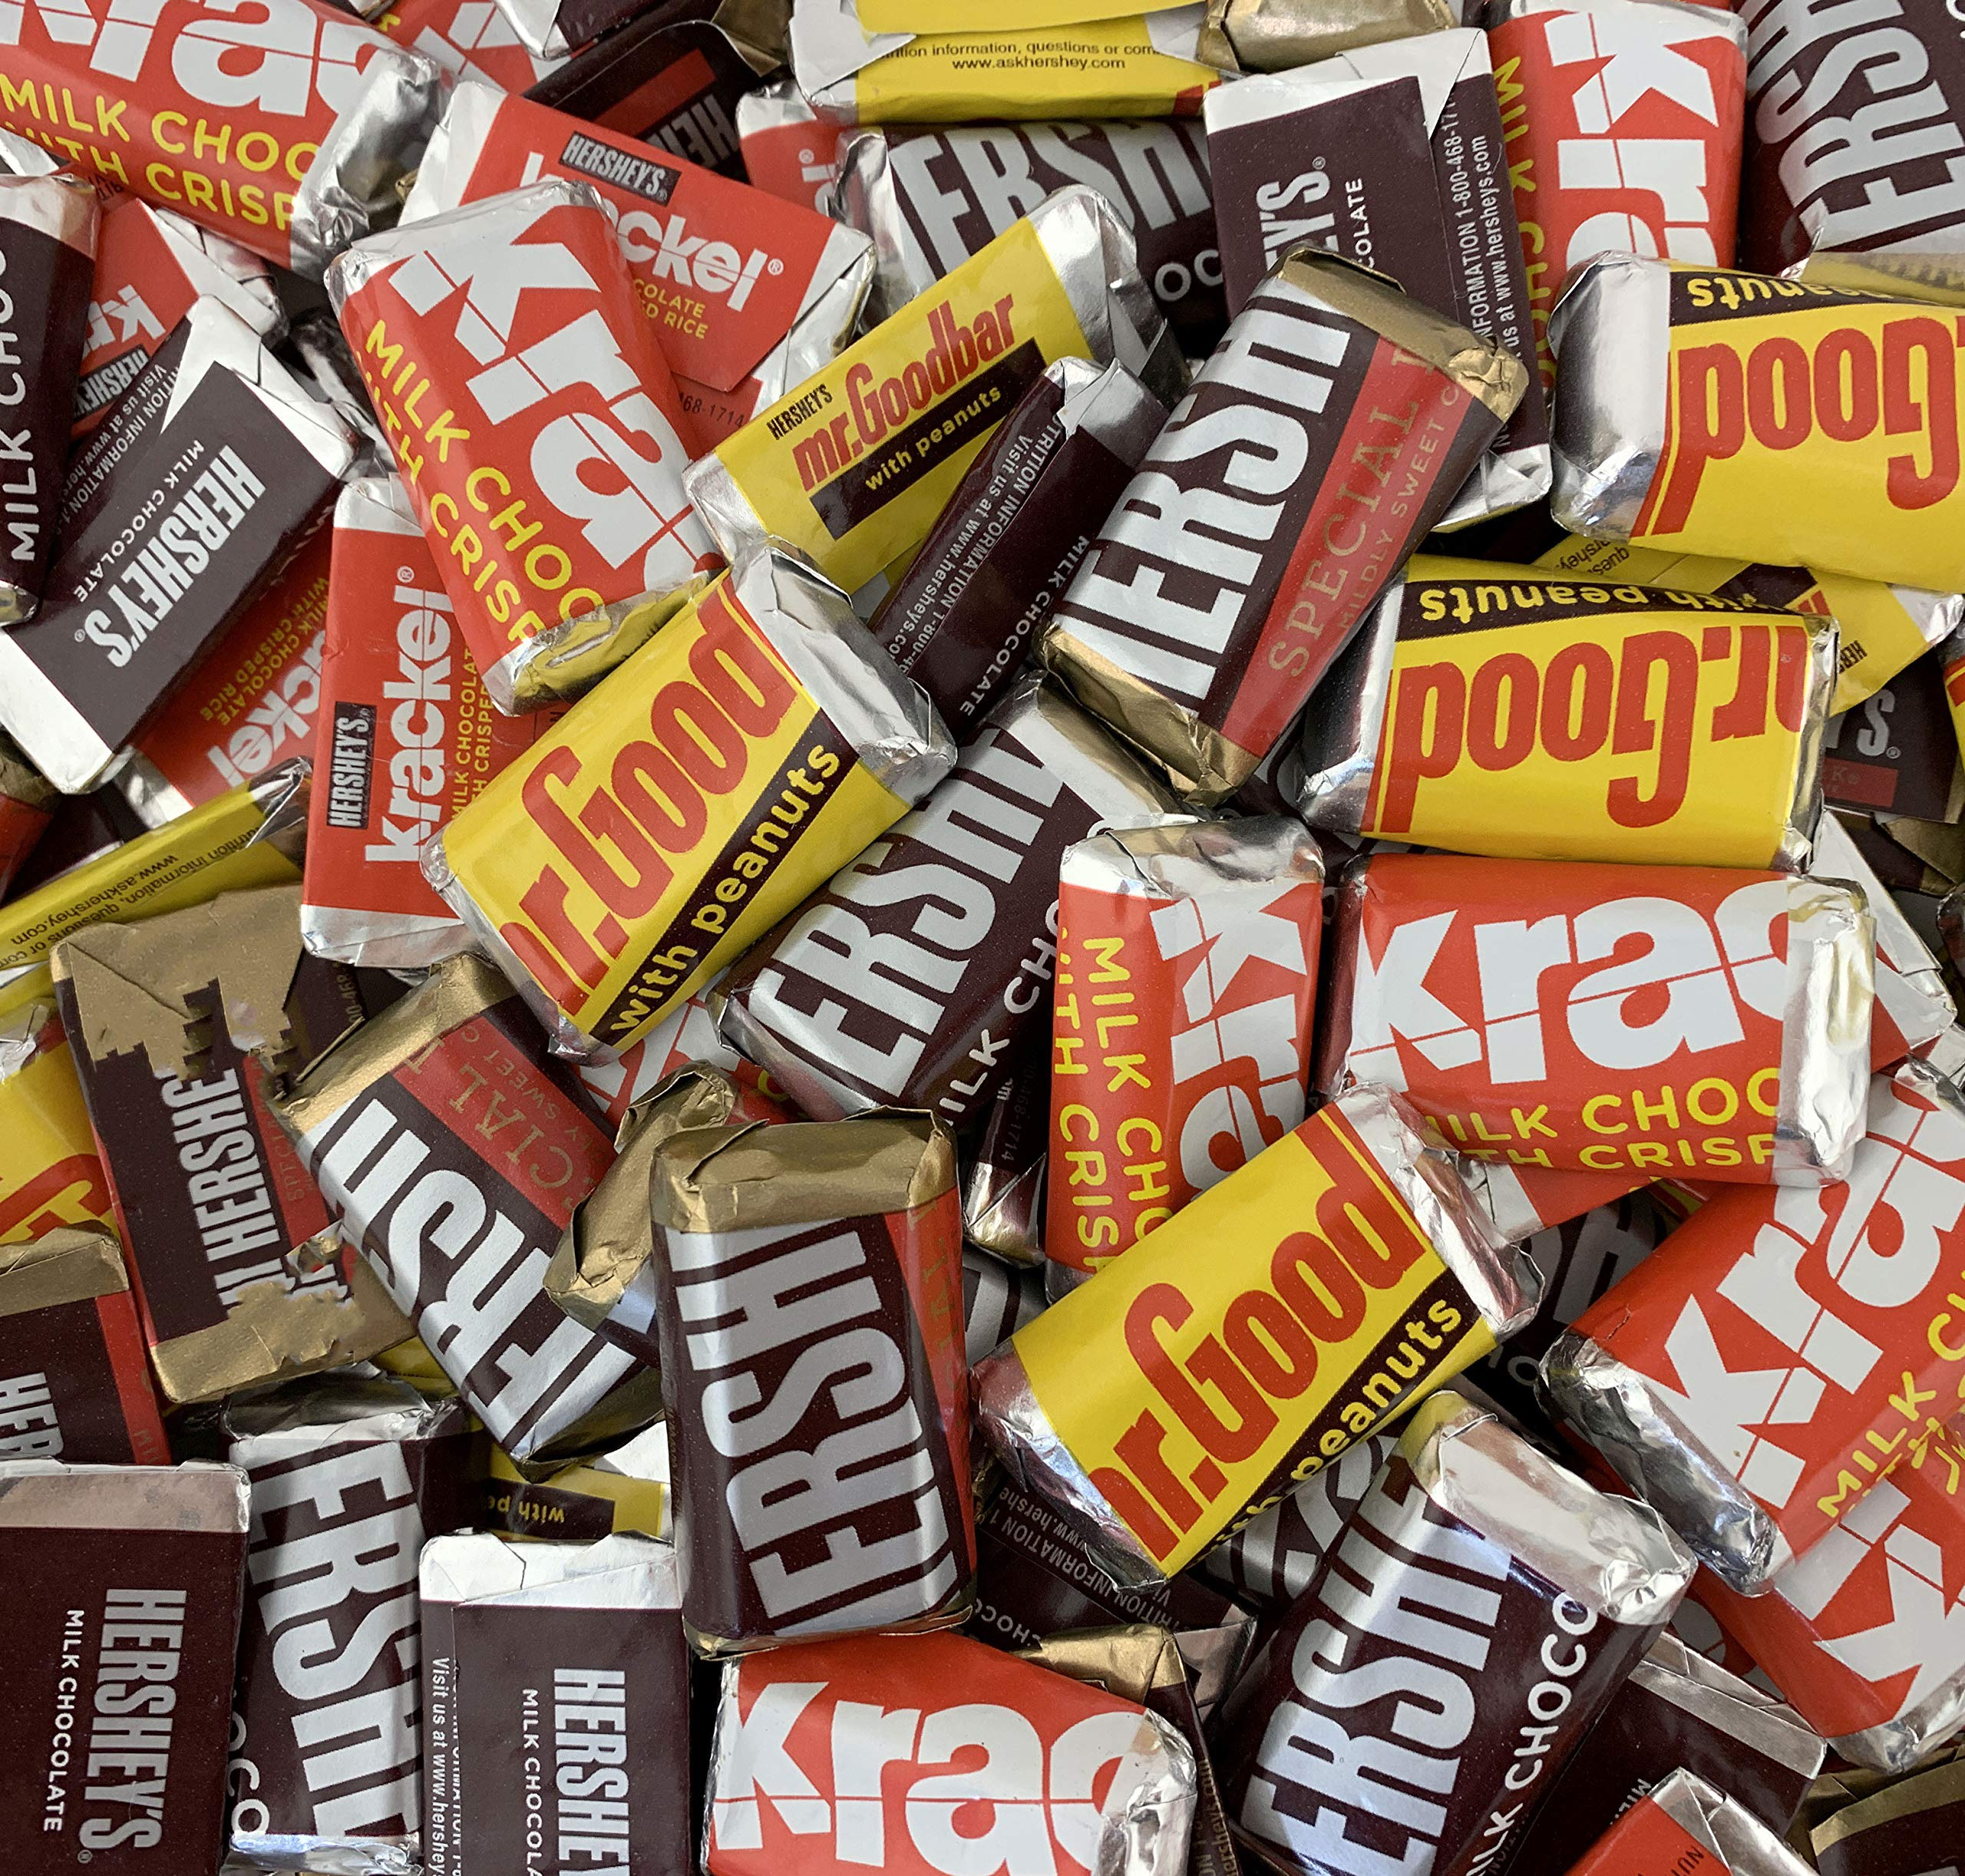 HERSHEY'S Chocolate Assorted Miniatures, MR. GOODBAR, HERSHEY'S SPECIAL DARK Chocolate, HERSHEY'S Milk Chocolate, KRACKEL Candy Bar, 2 Pounds Bag